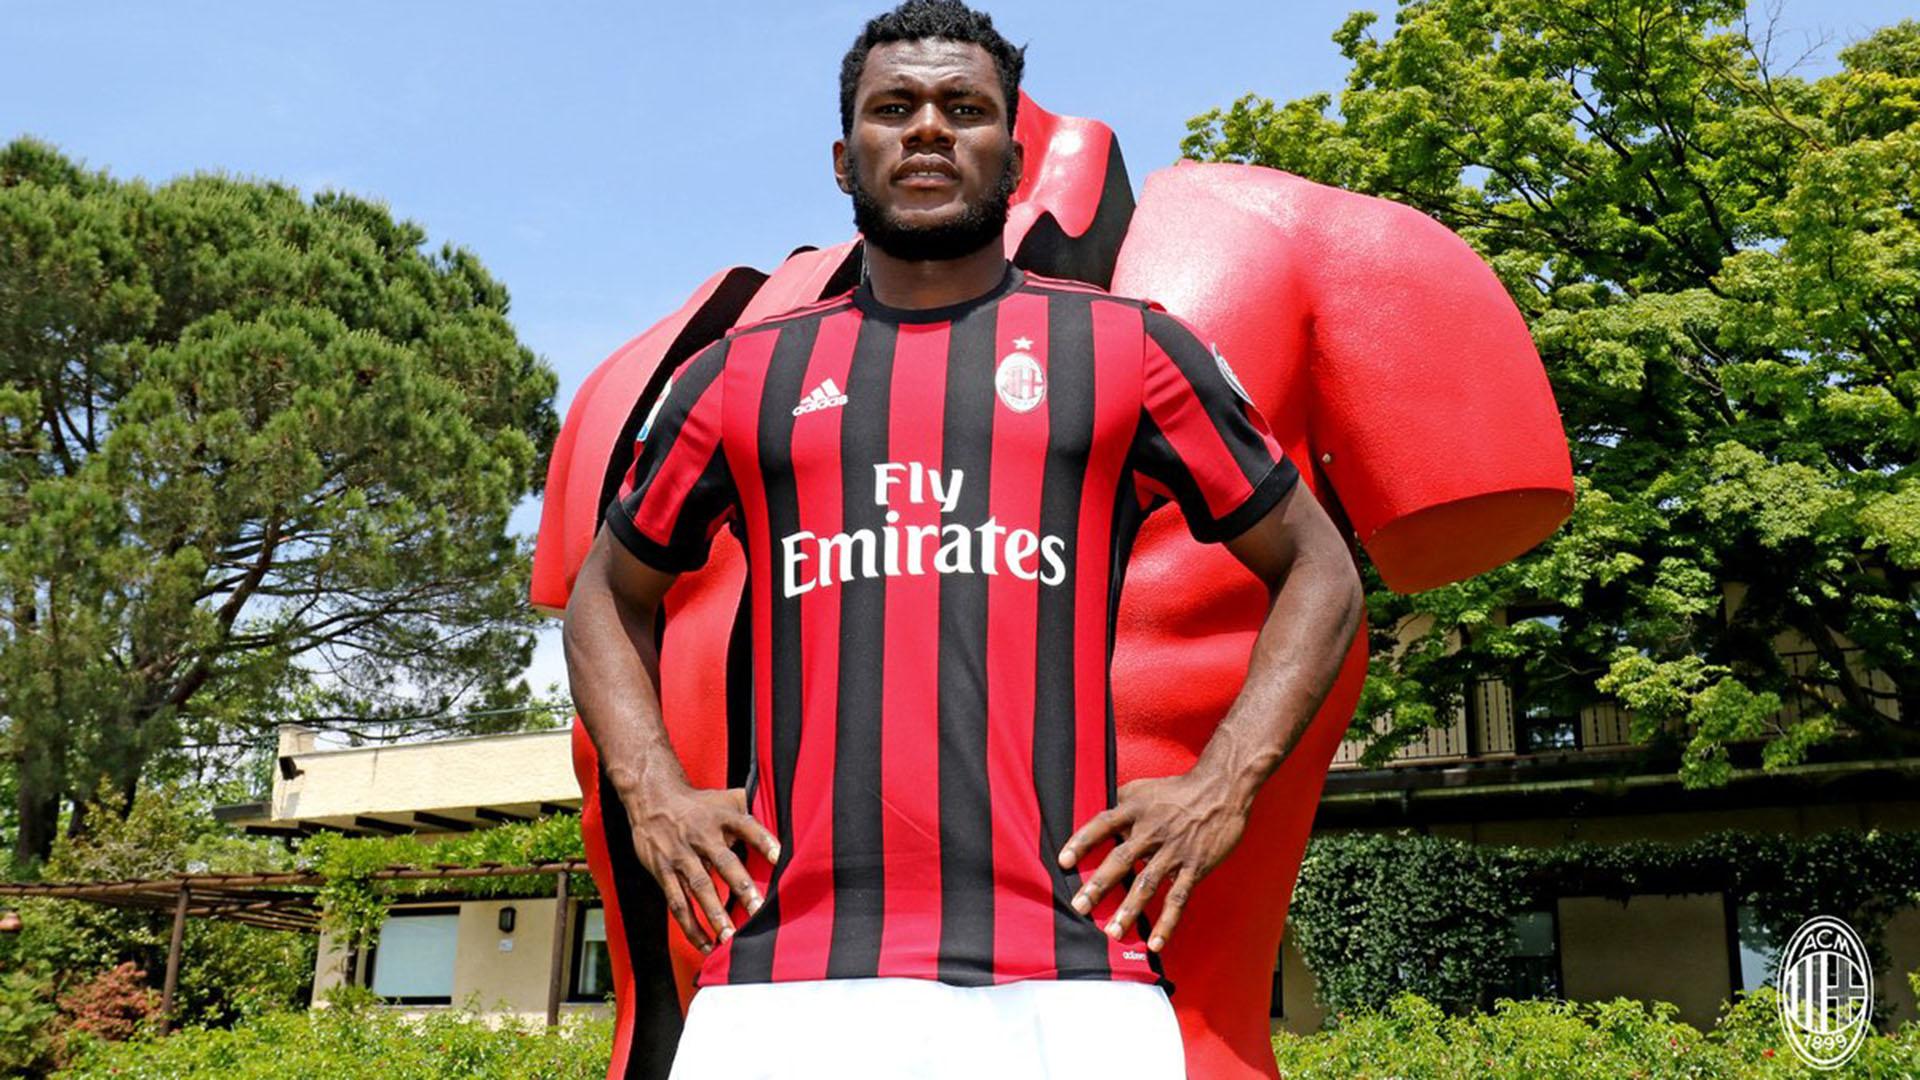 Ufficiale: Franck Kessie al Milan